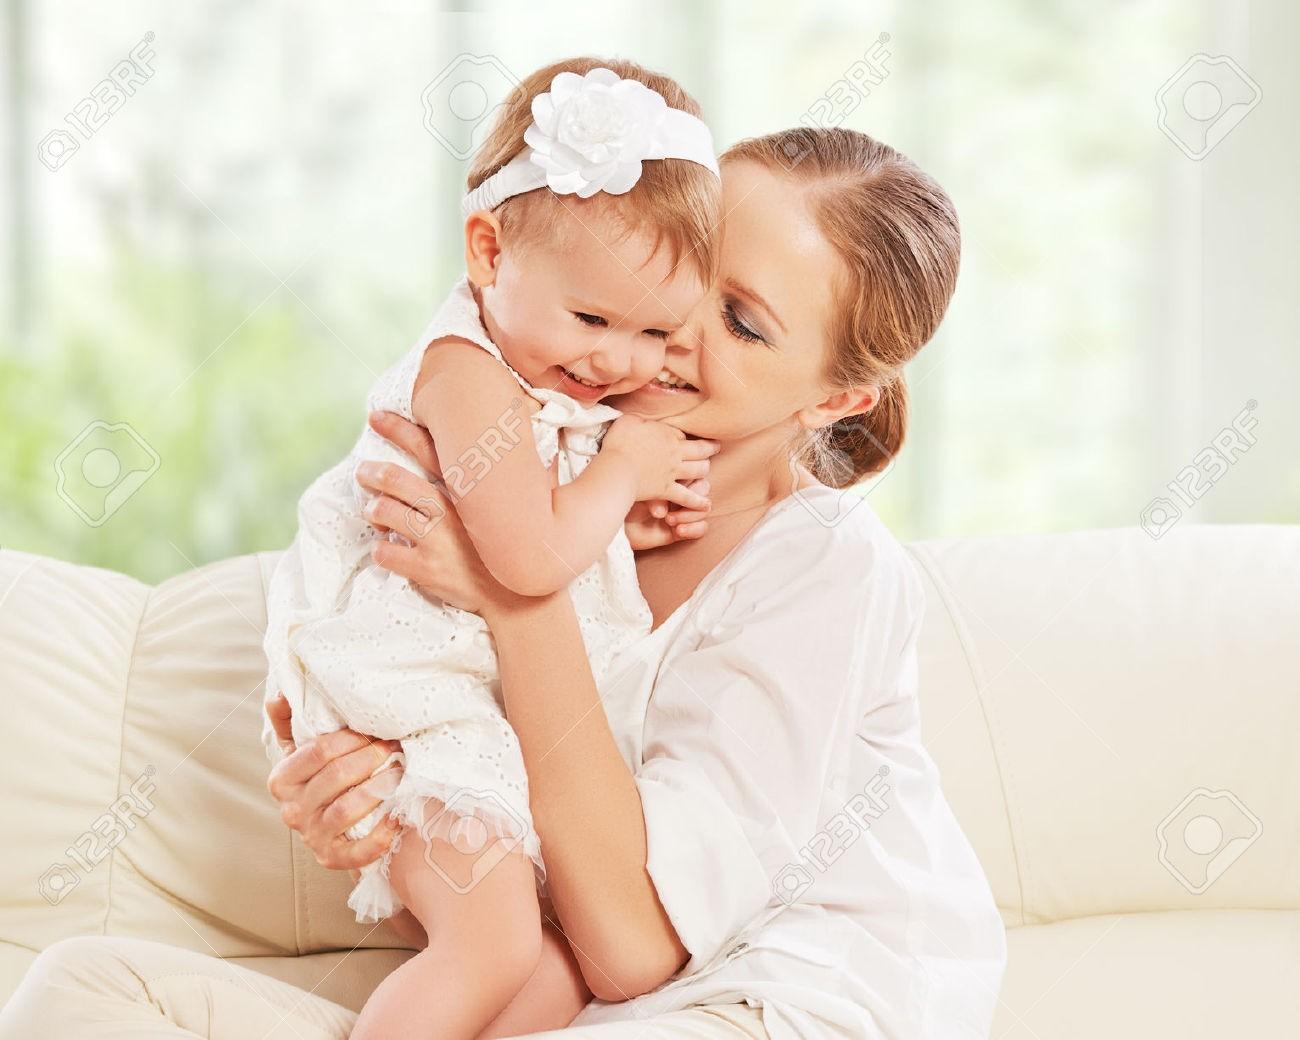 Ученые поняли, как пол ребенка влияет наиммунитет будущей матери